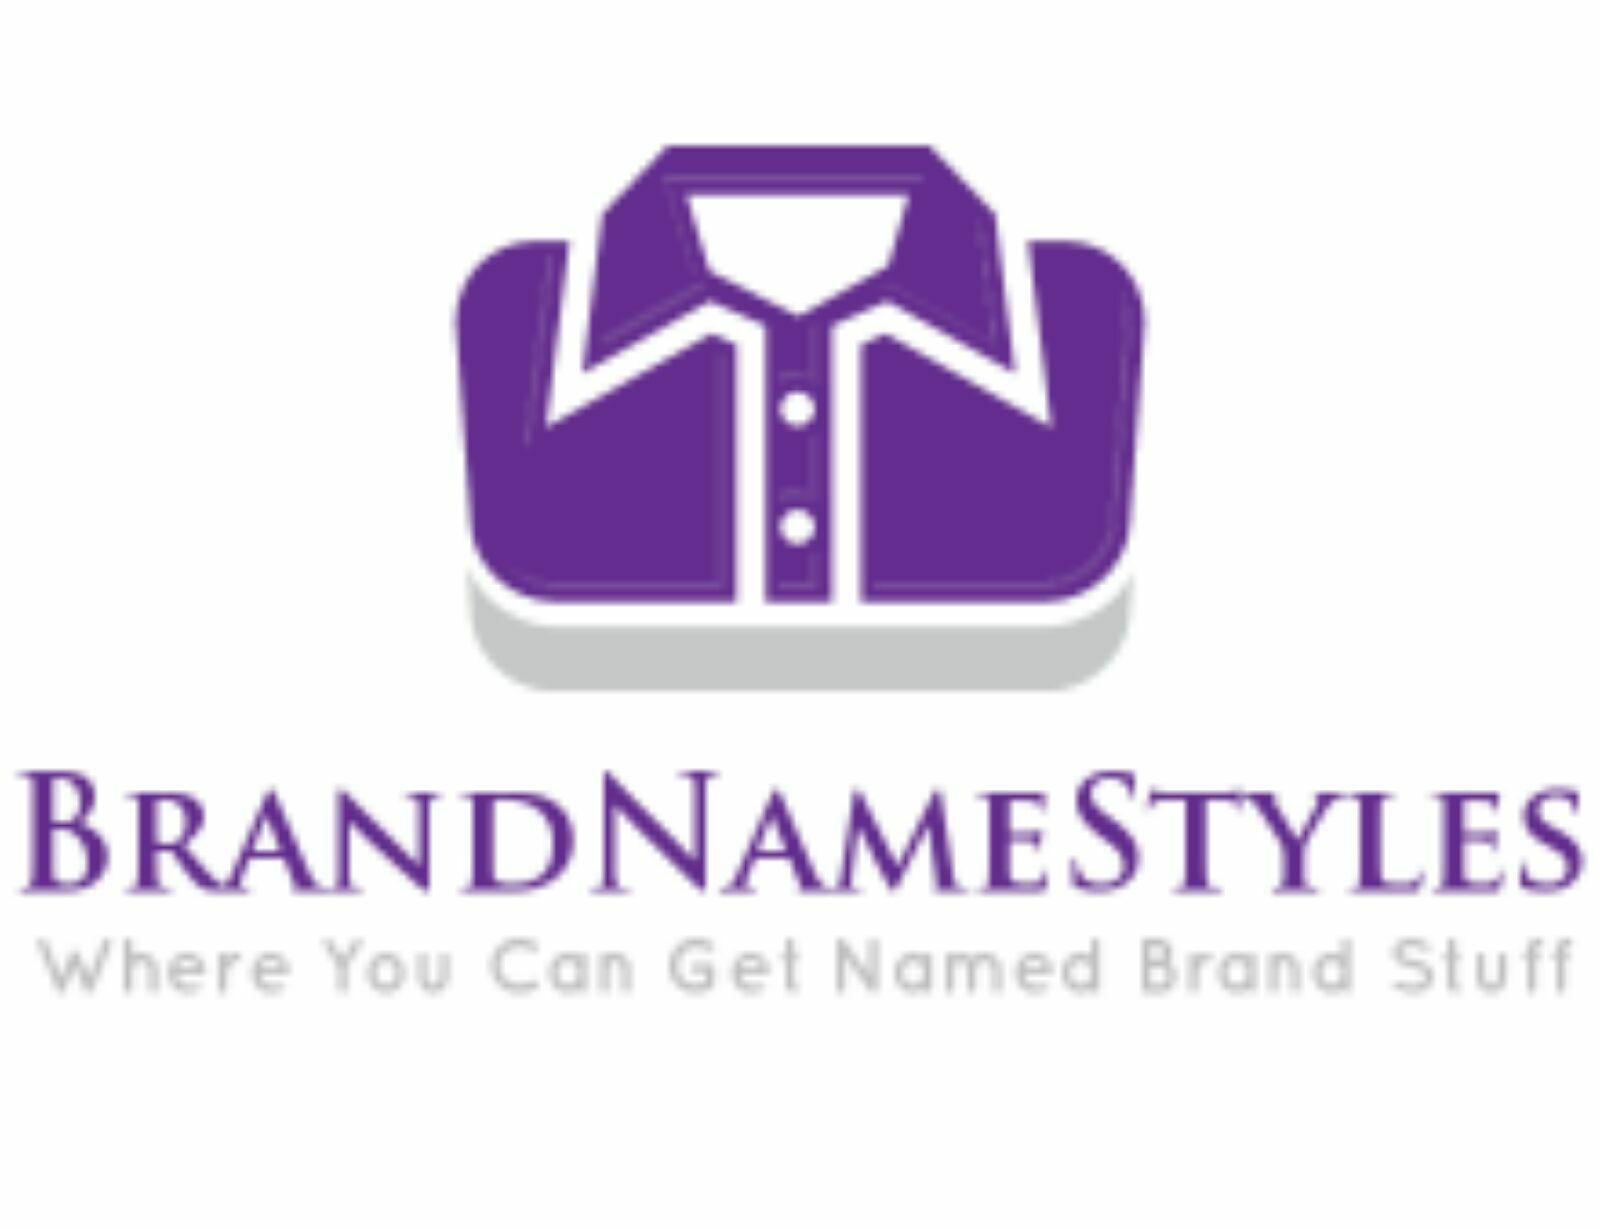 Brand Name Styles